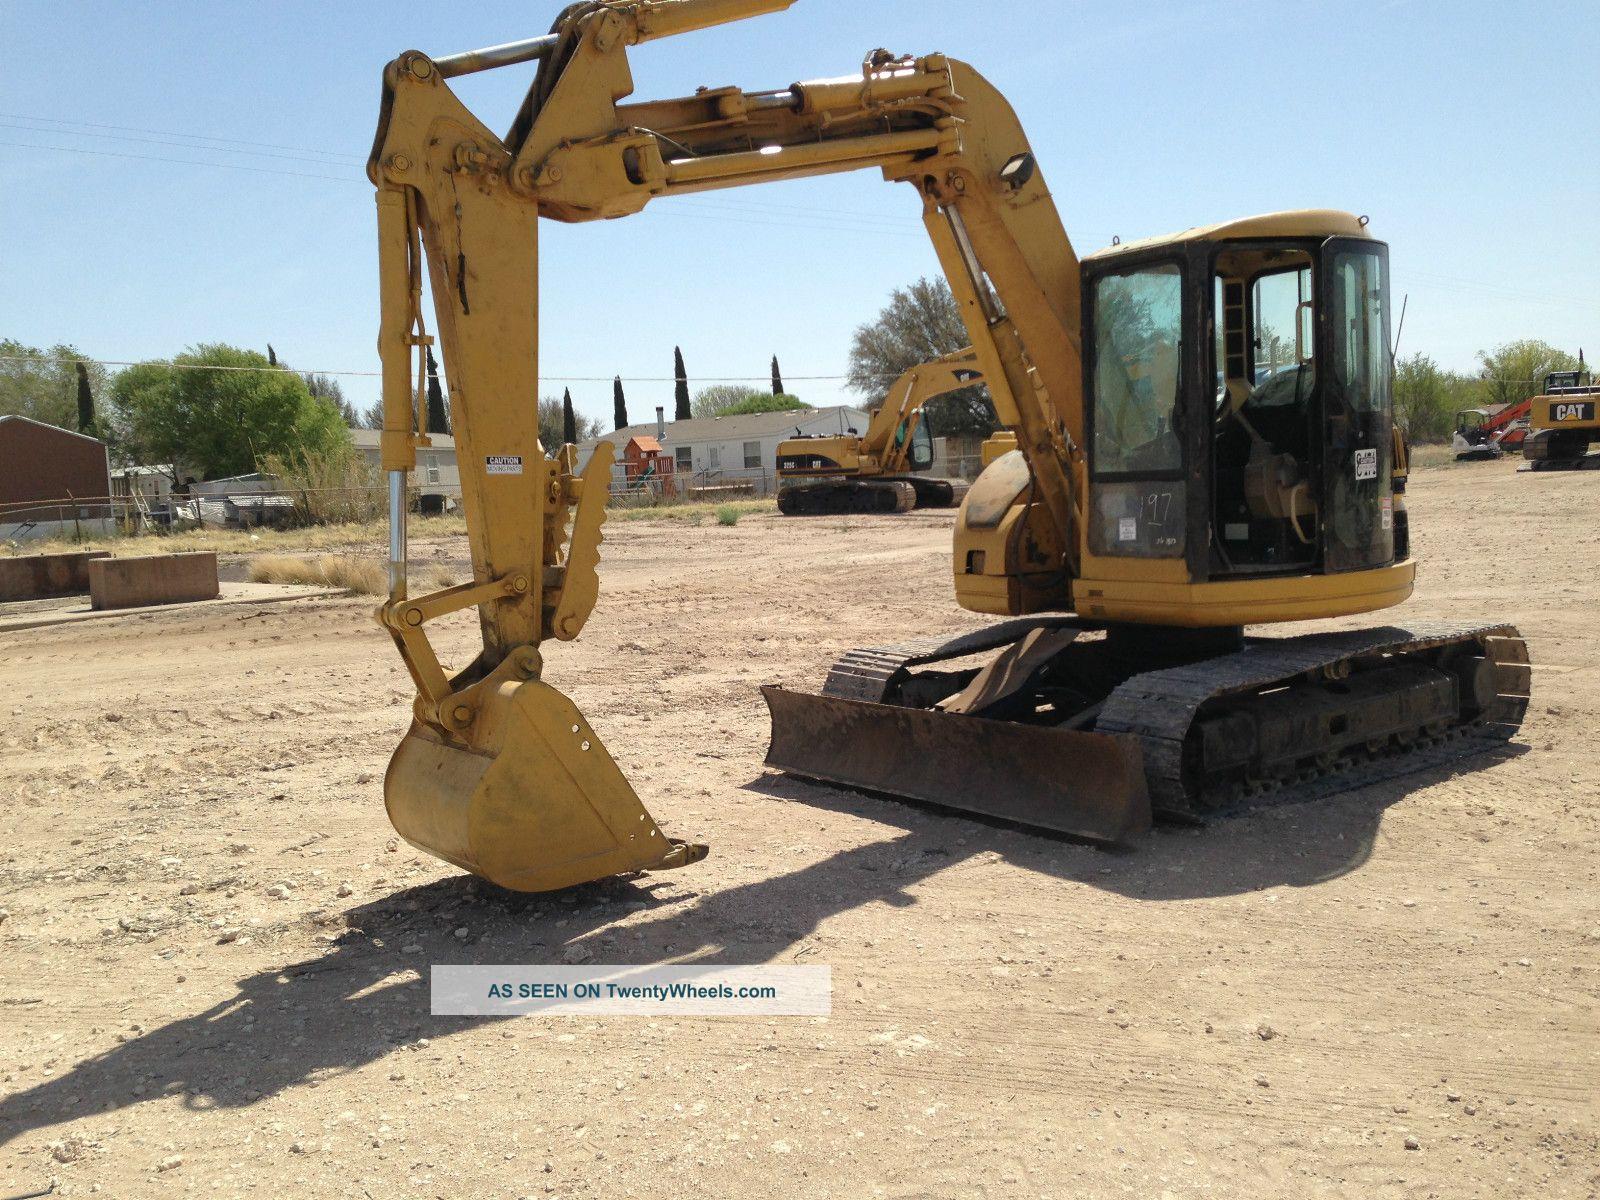 Caterpillar 308b Hydraulic Excavator Crawler Tractor Dozer Loader 308 B Cab Excavators photo